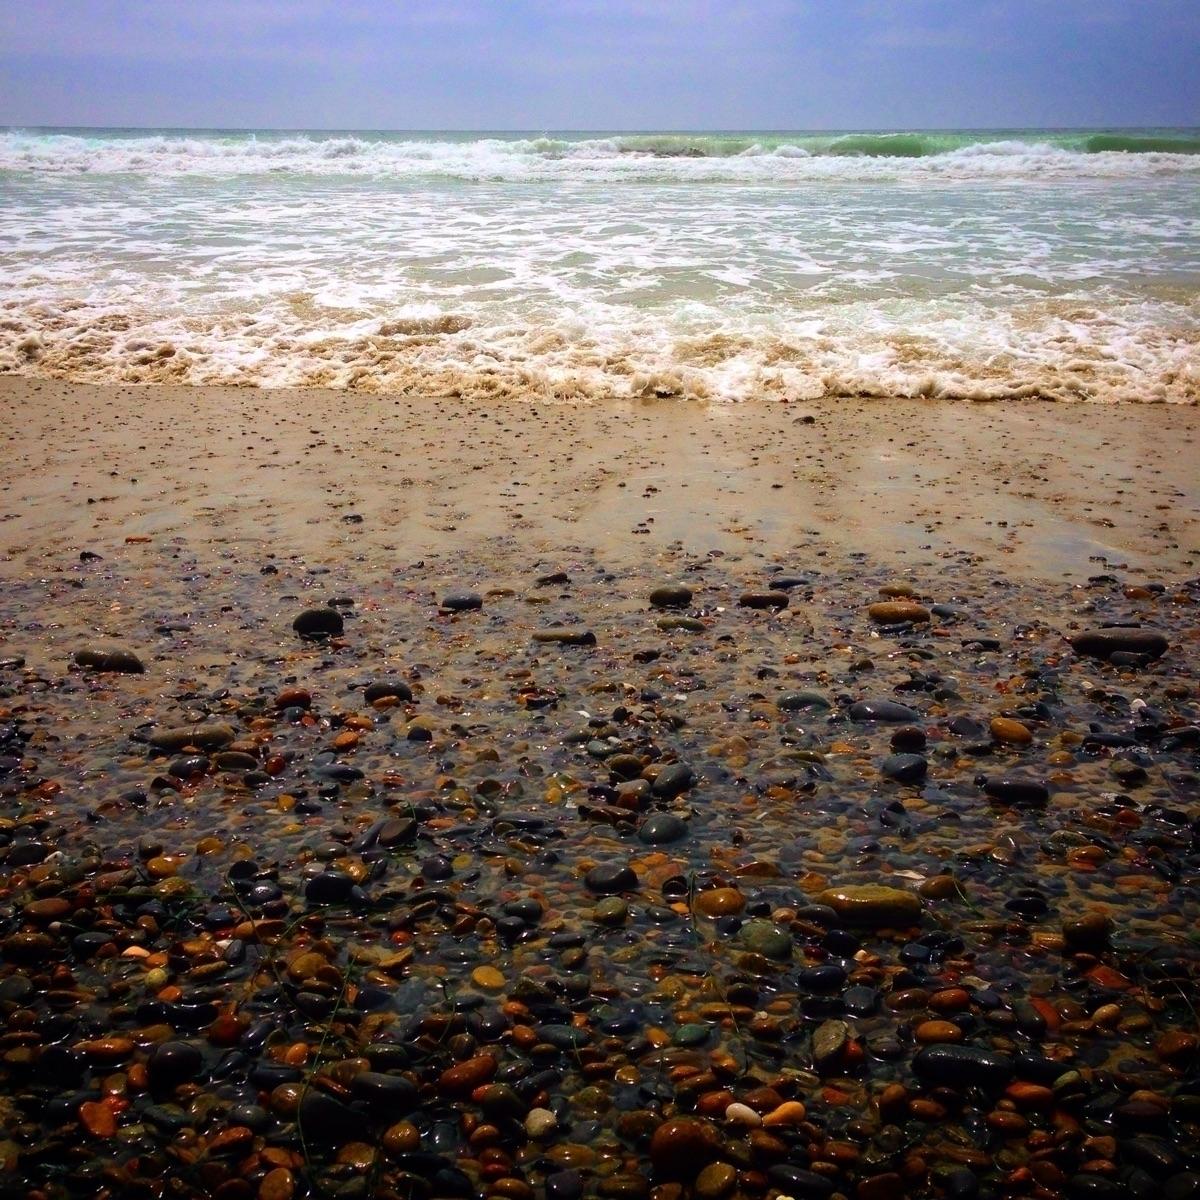 turbulent wave life recede, lea - alexgzarate | ello